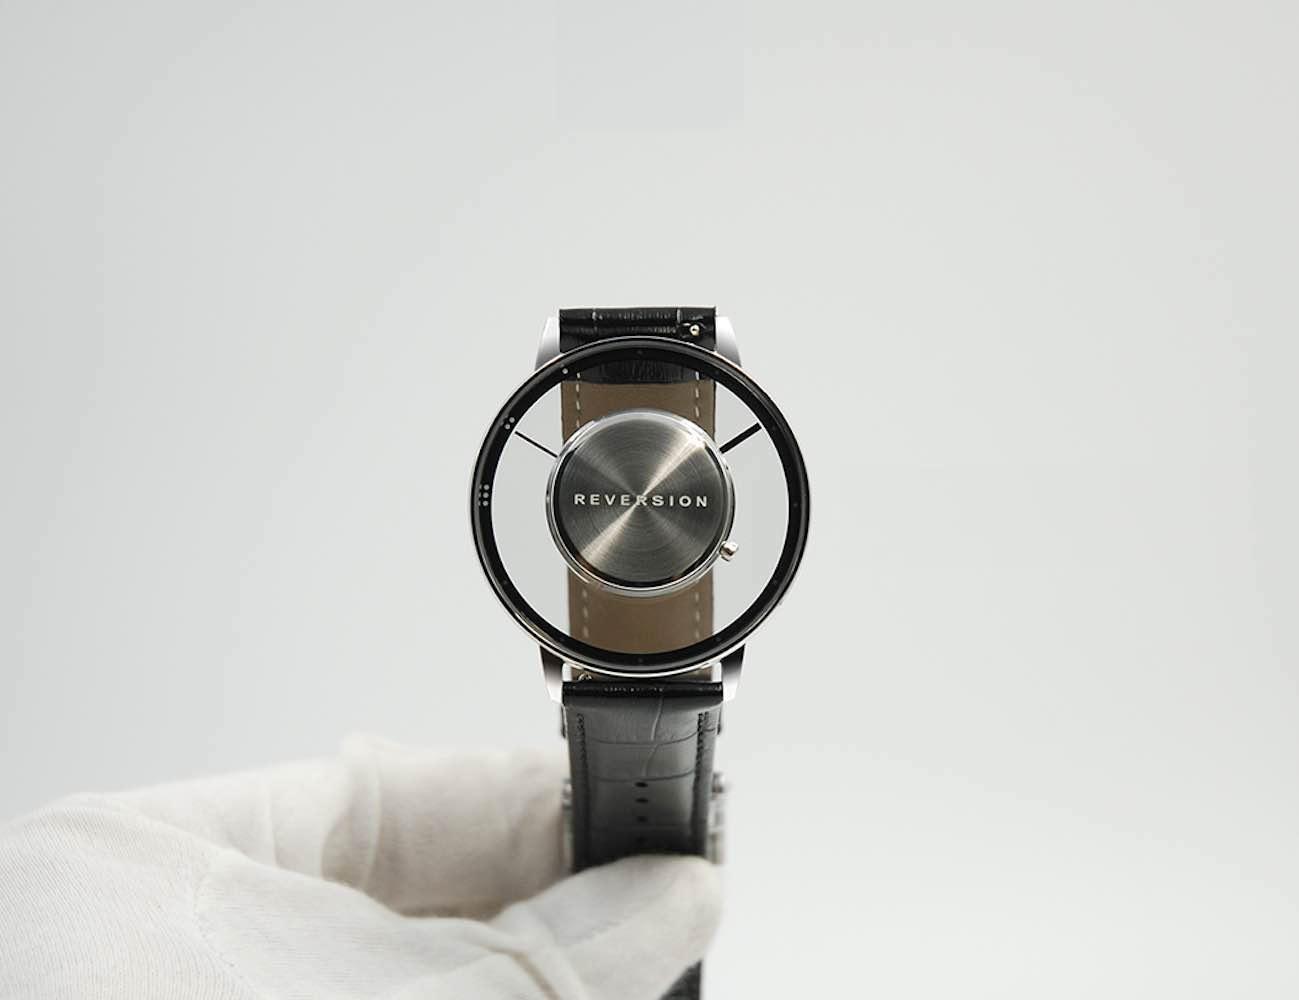 Reversion+%26%238211%3B+The+Watch